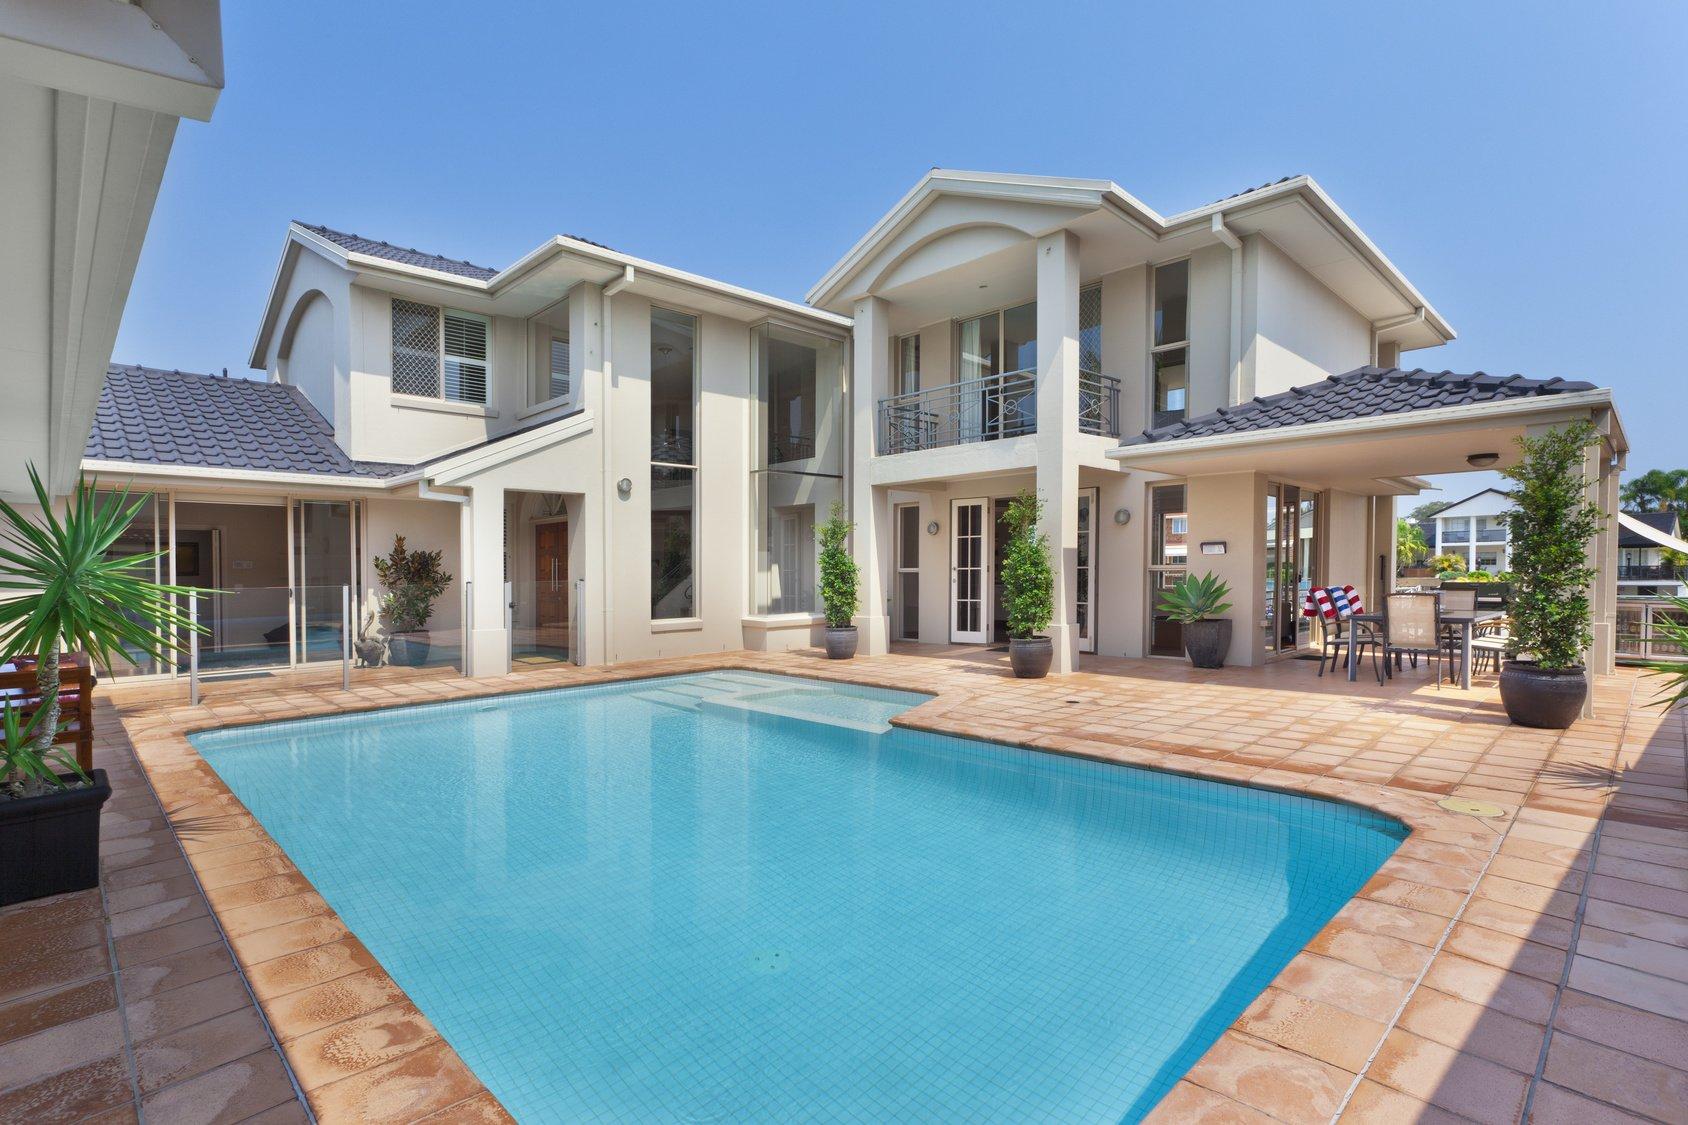 pool u0026 homeowners insurance sacramento ca